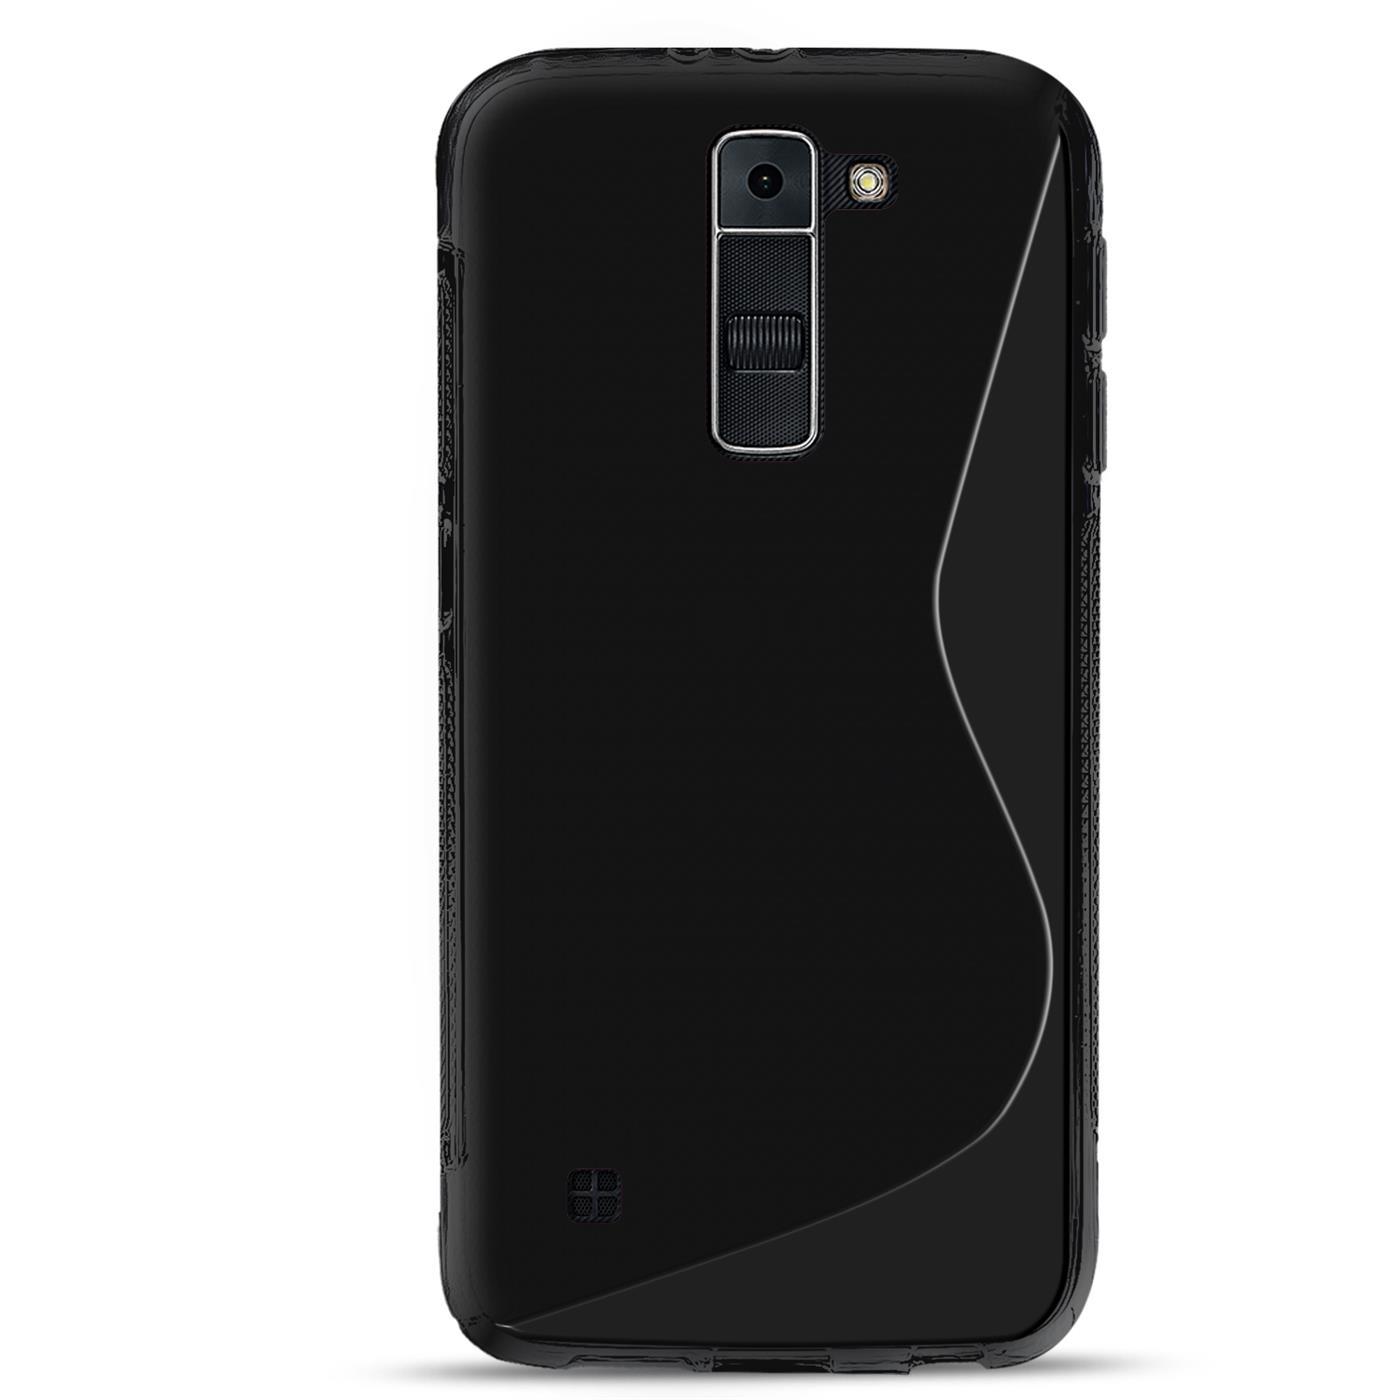 LG-Leon-LTE-Silikon-Gel-S-Line-Case-Cover-Ultra-Thin-Slim-Back-Bumper Indexbild 21